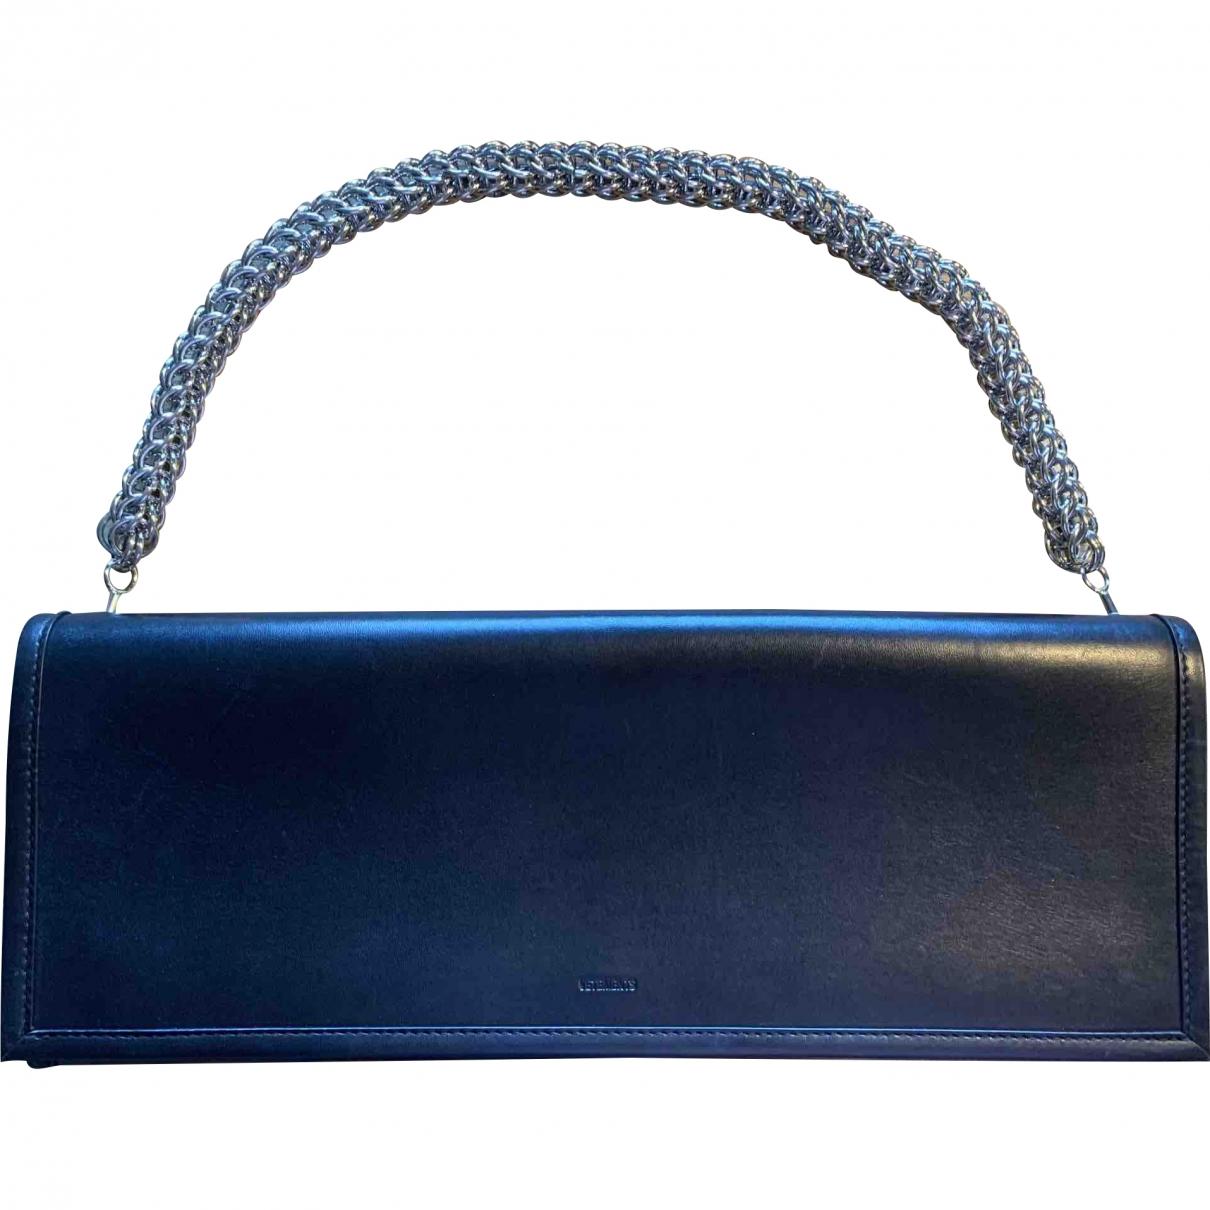 Vetements \N Black Leather Clutch bag for Women \N